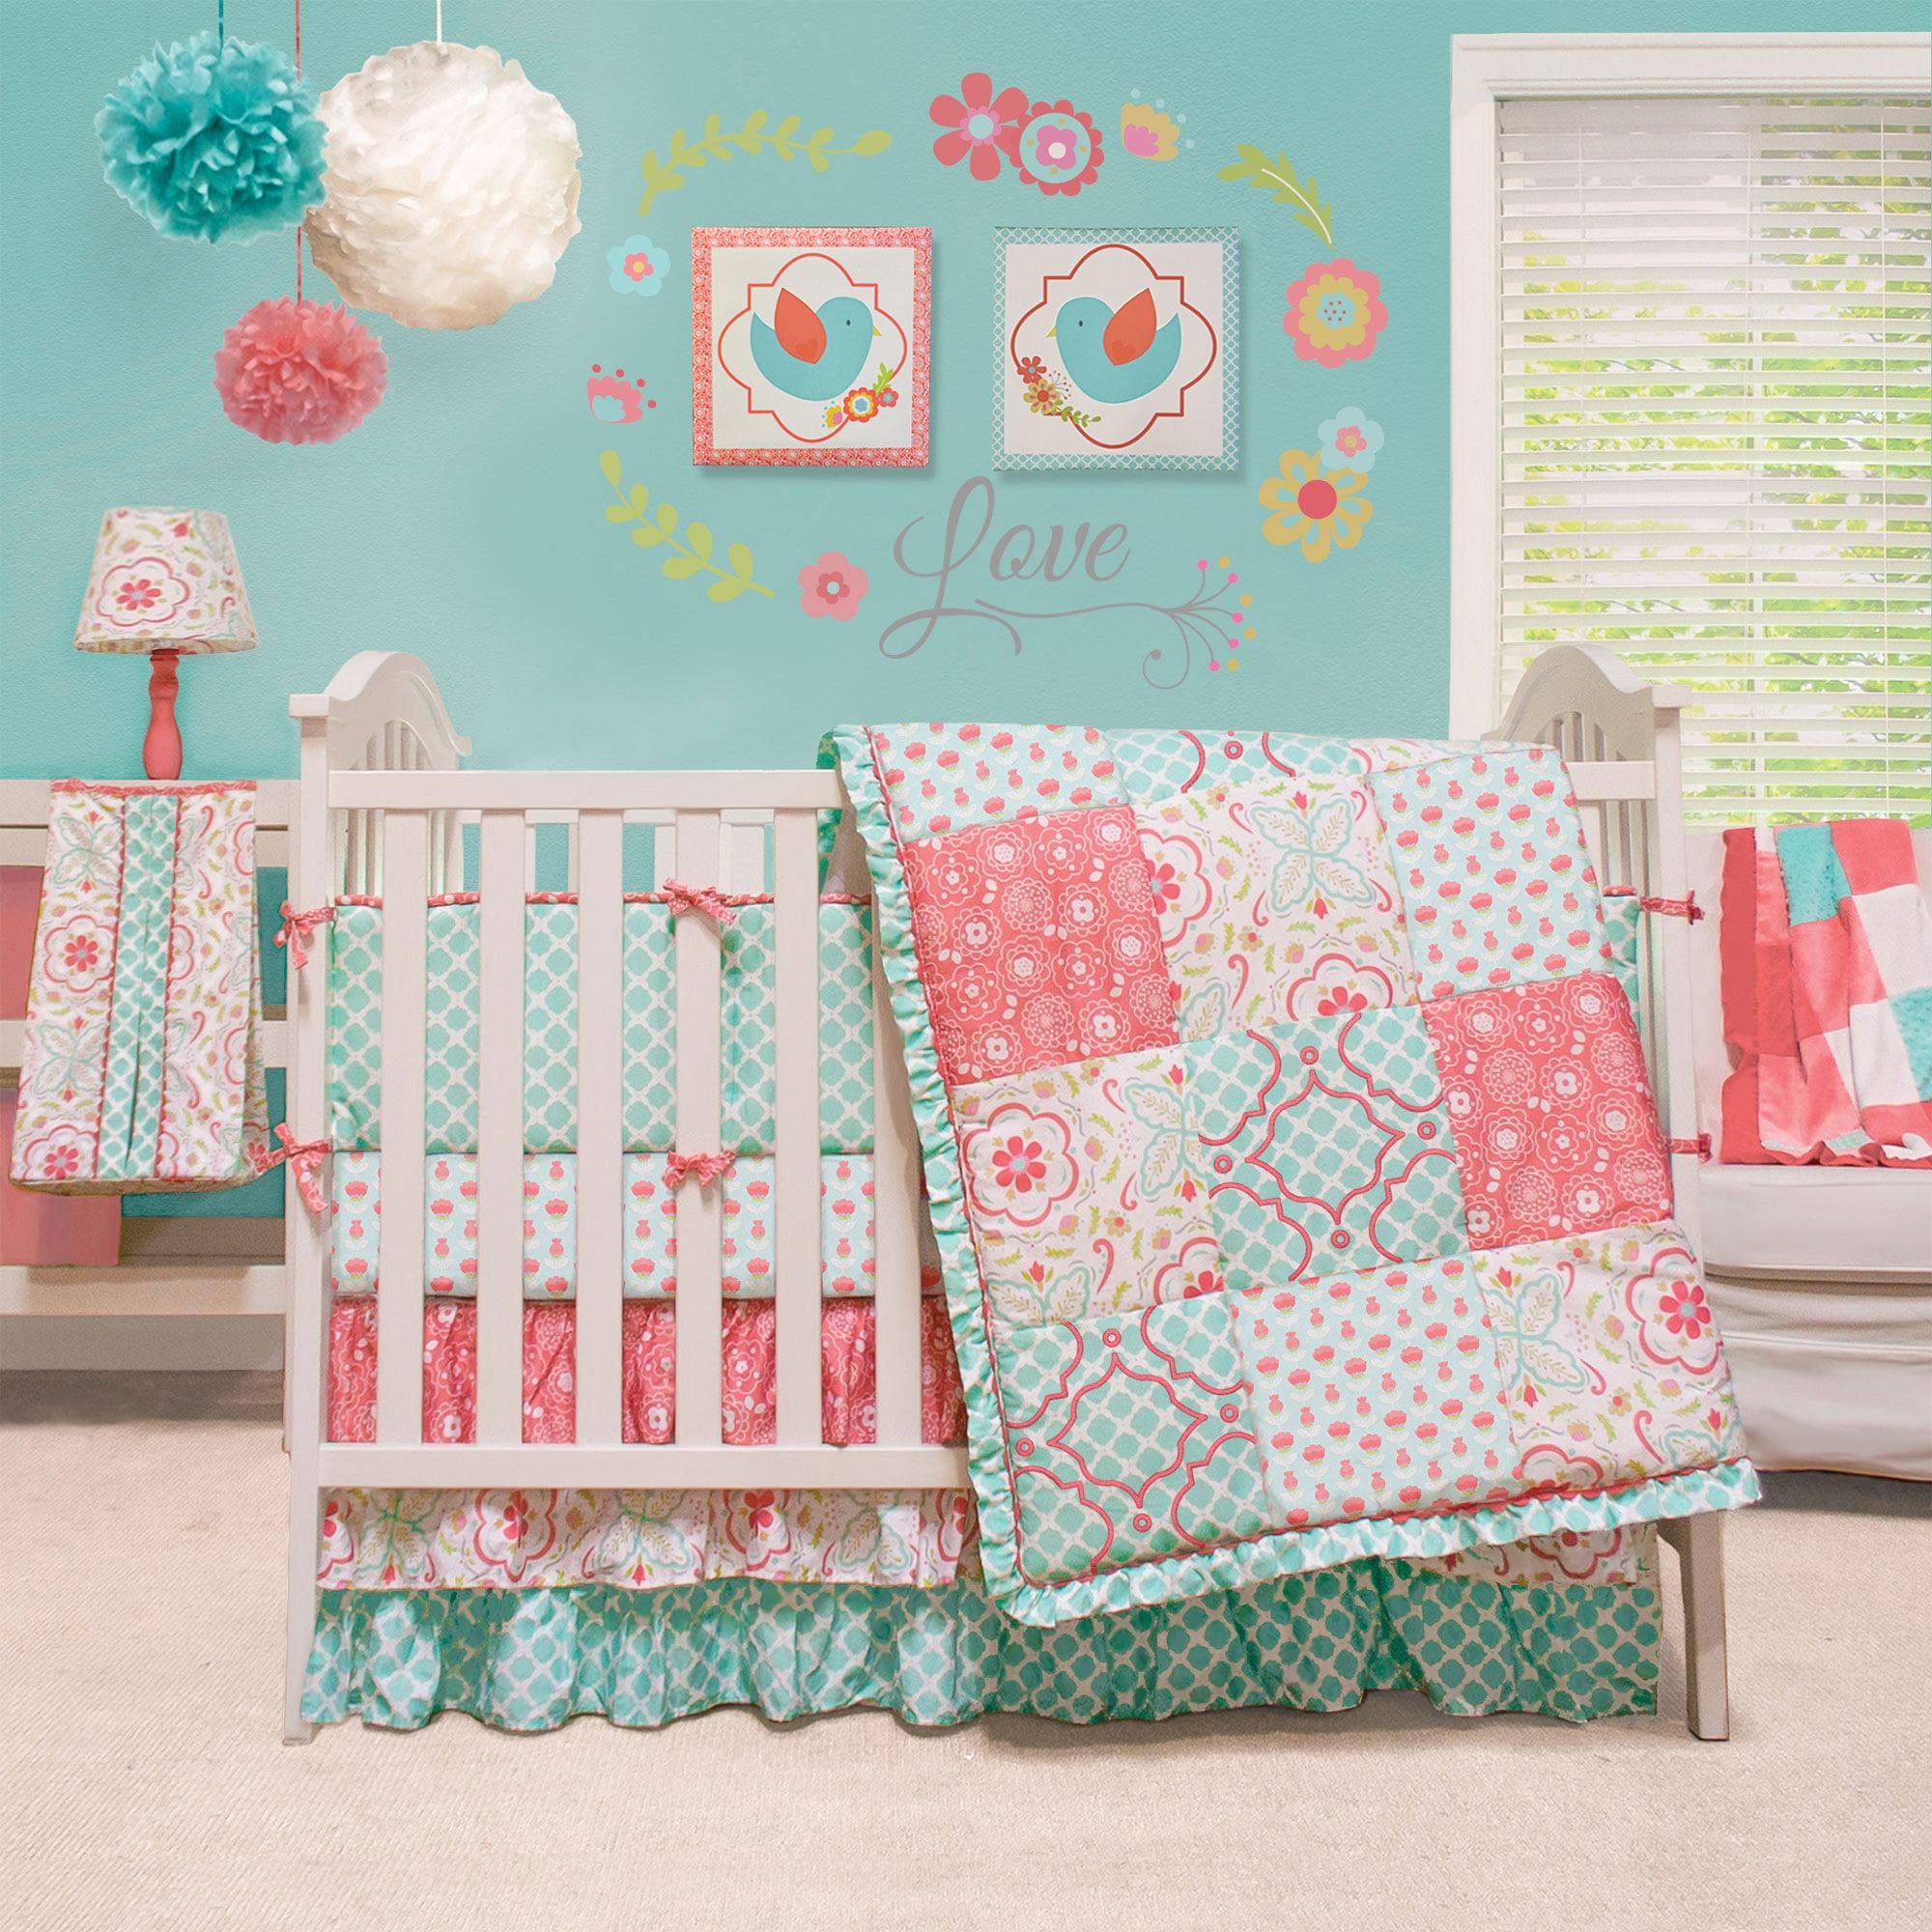 Baby bedding crib sets - The Peanut Shell Baby Girl Crib Bedding Set Coral And Aqua Mila 4 Piece Set Walmart Com